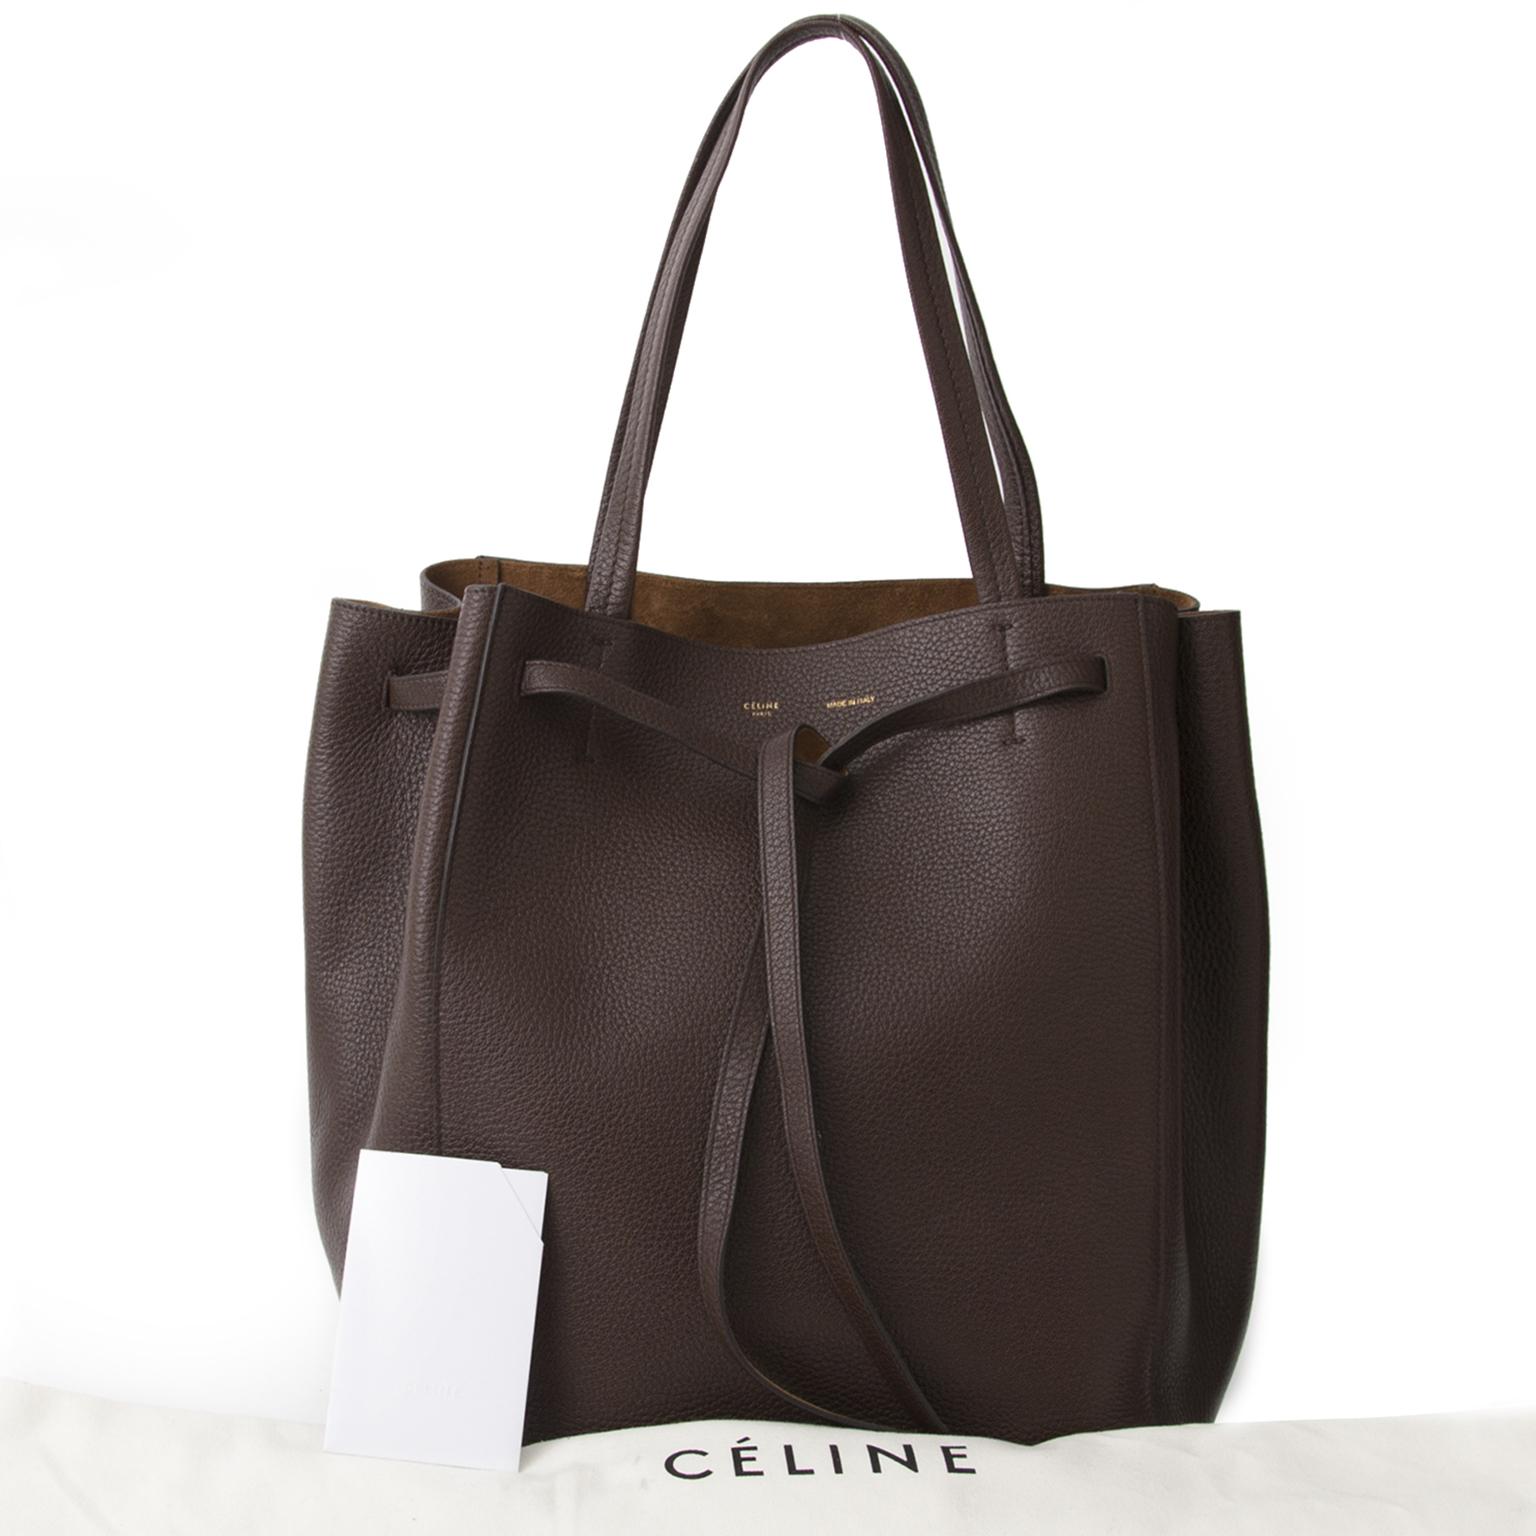 646ff6fa63 ... Celine Cabas Phantom Chocolat Brown best price online webshop labellov .com